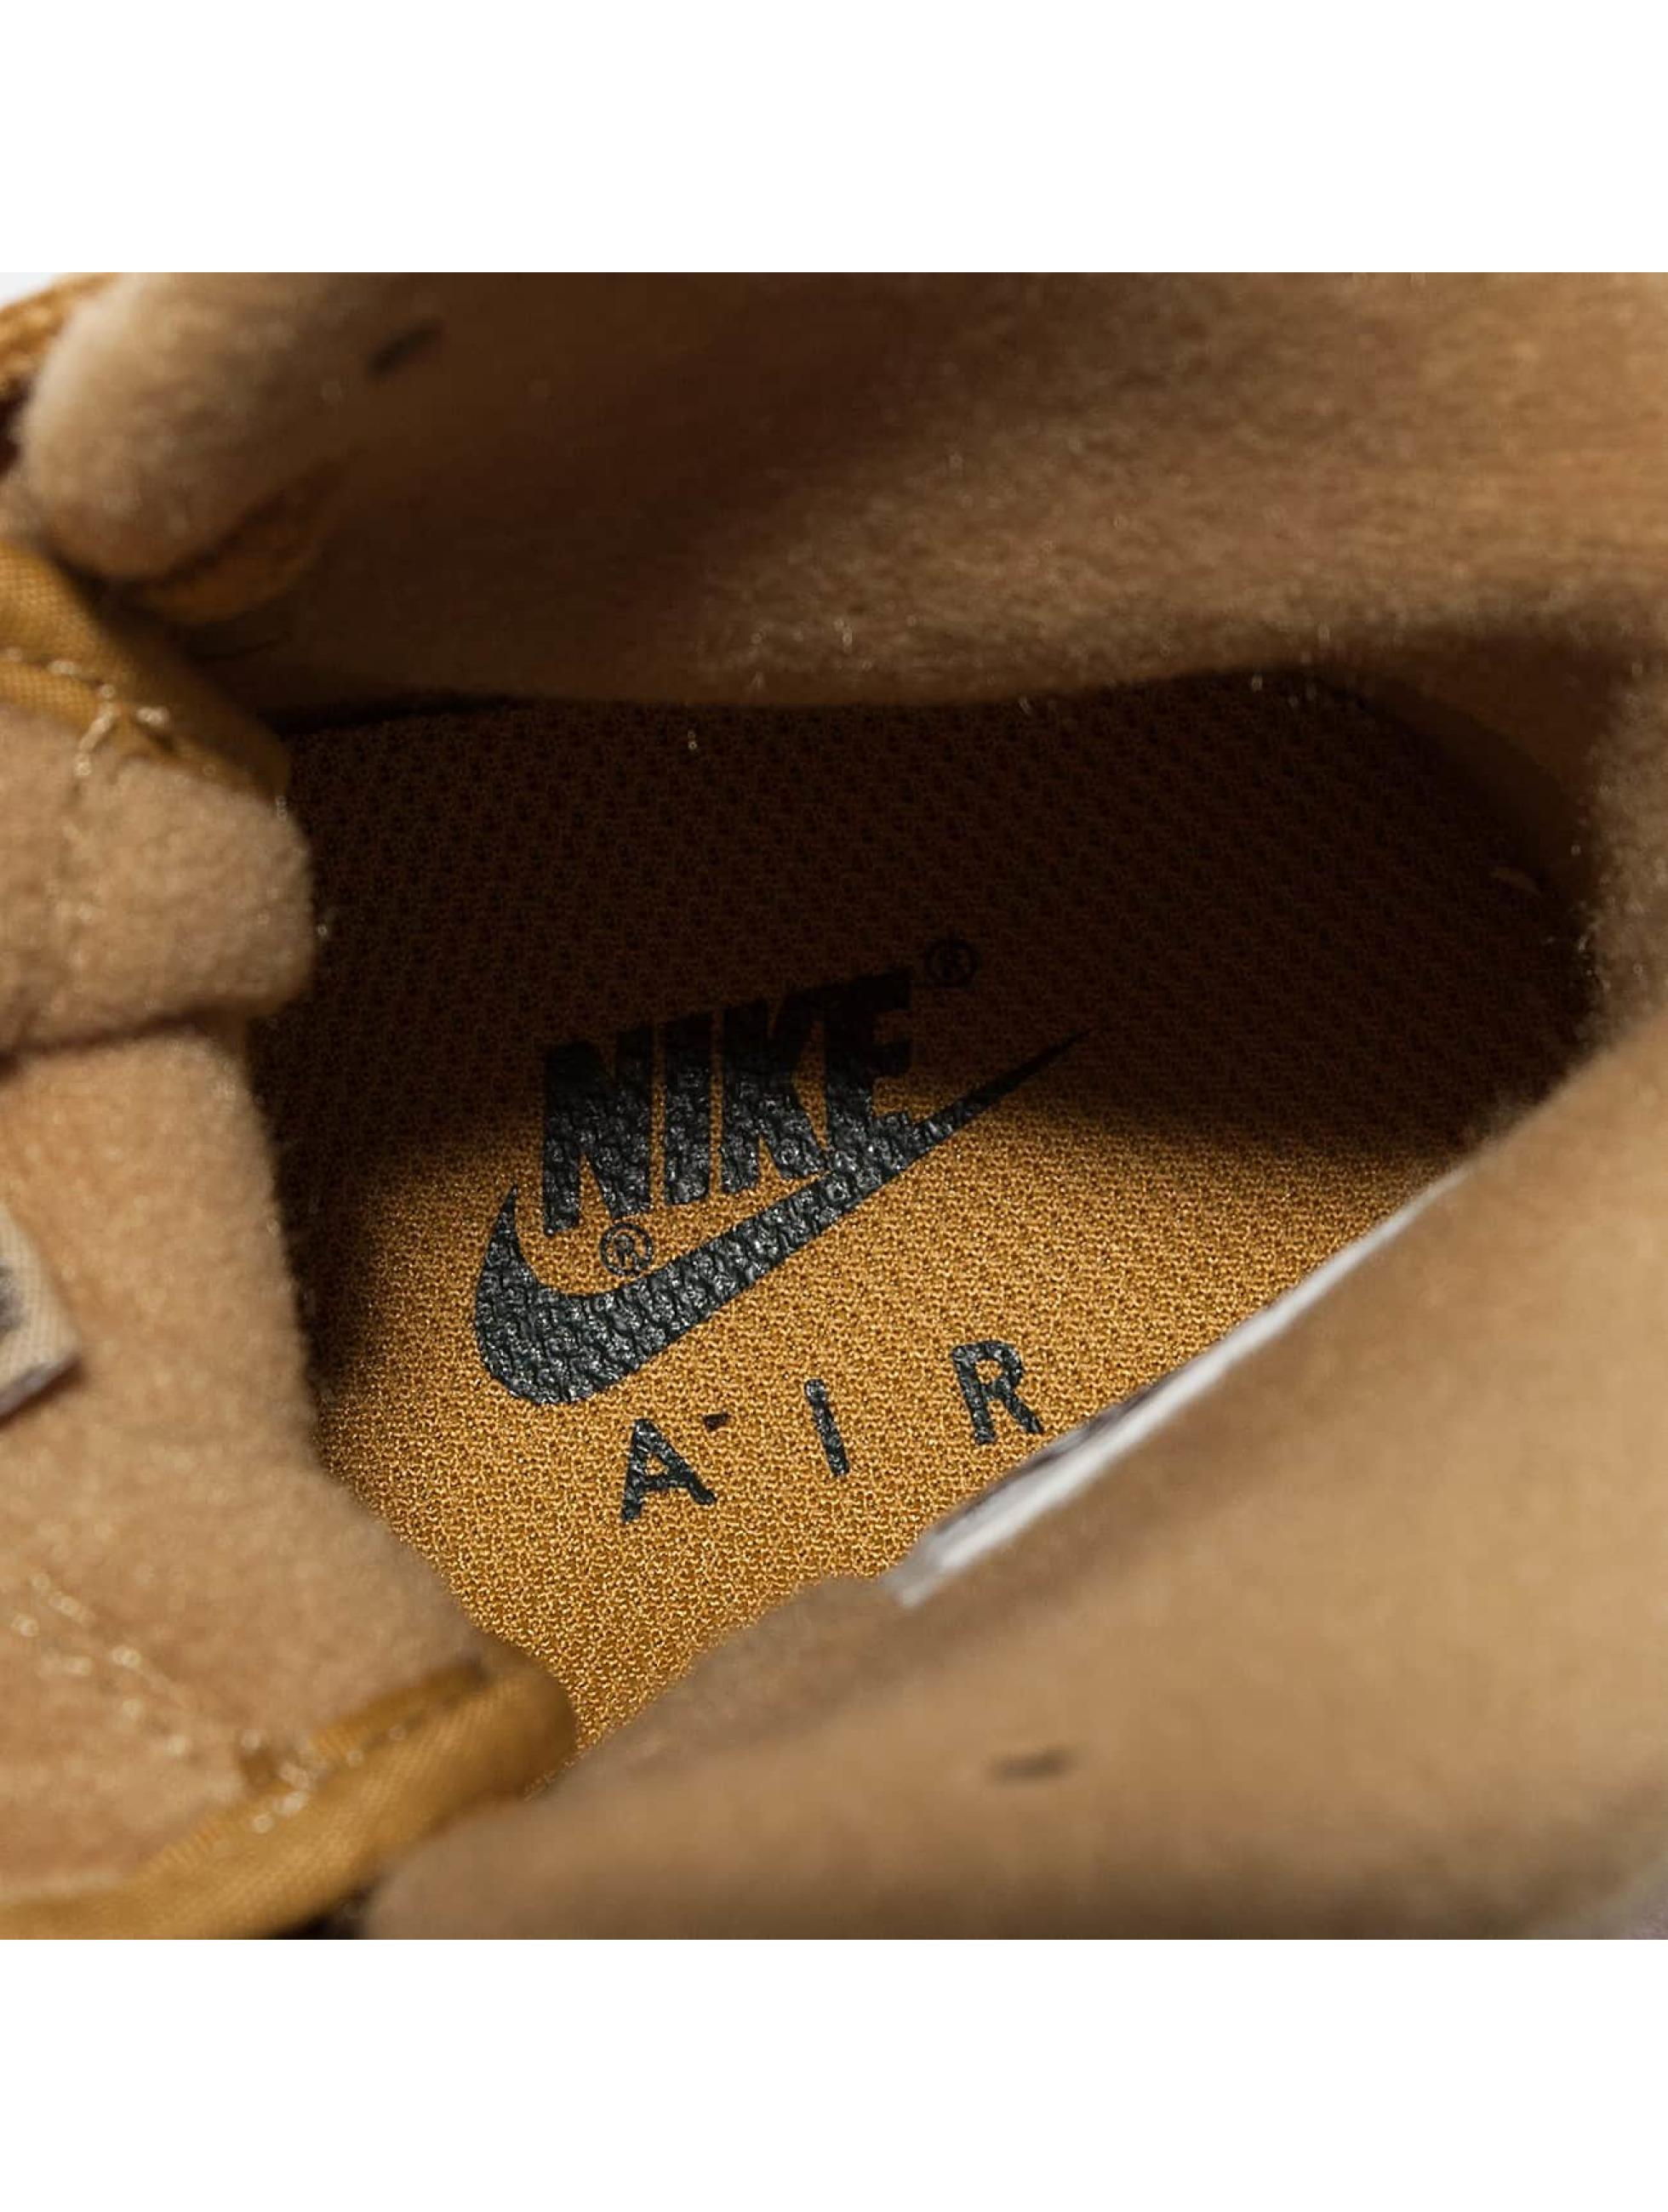 Nike Zapatillas de deporte Air Force 1 High WB marrón